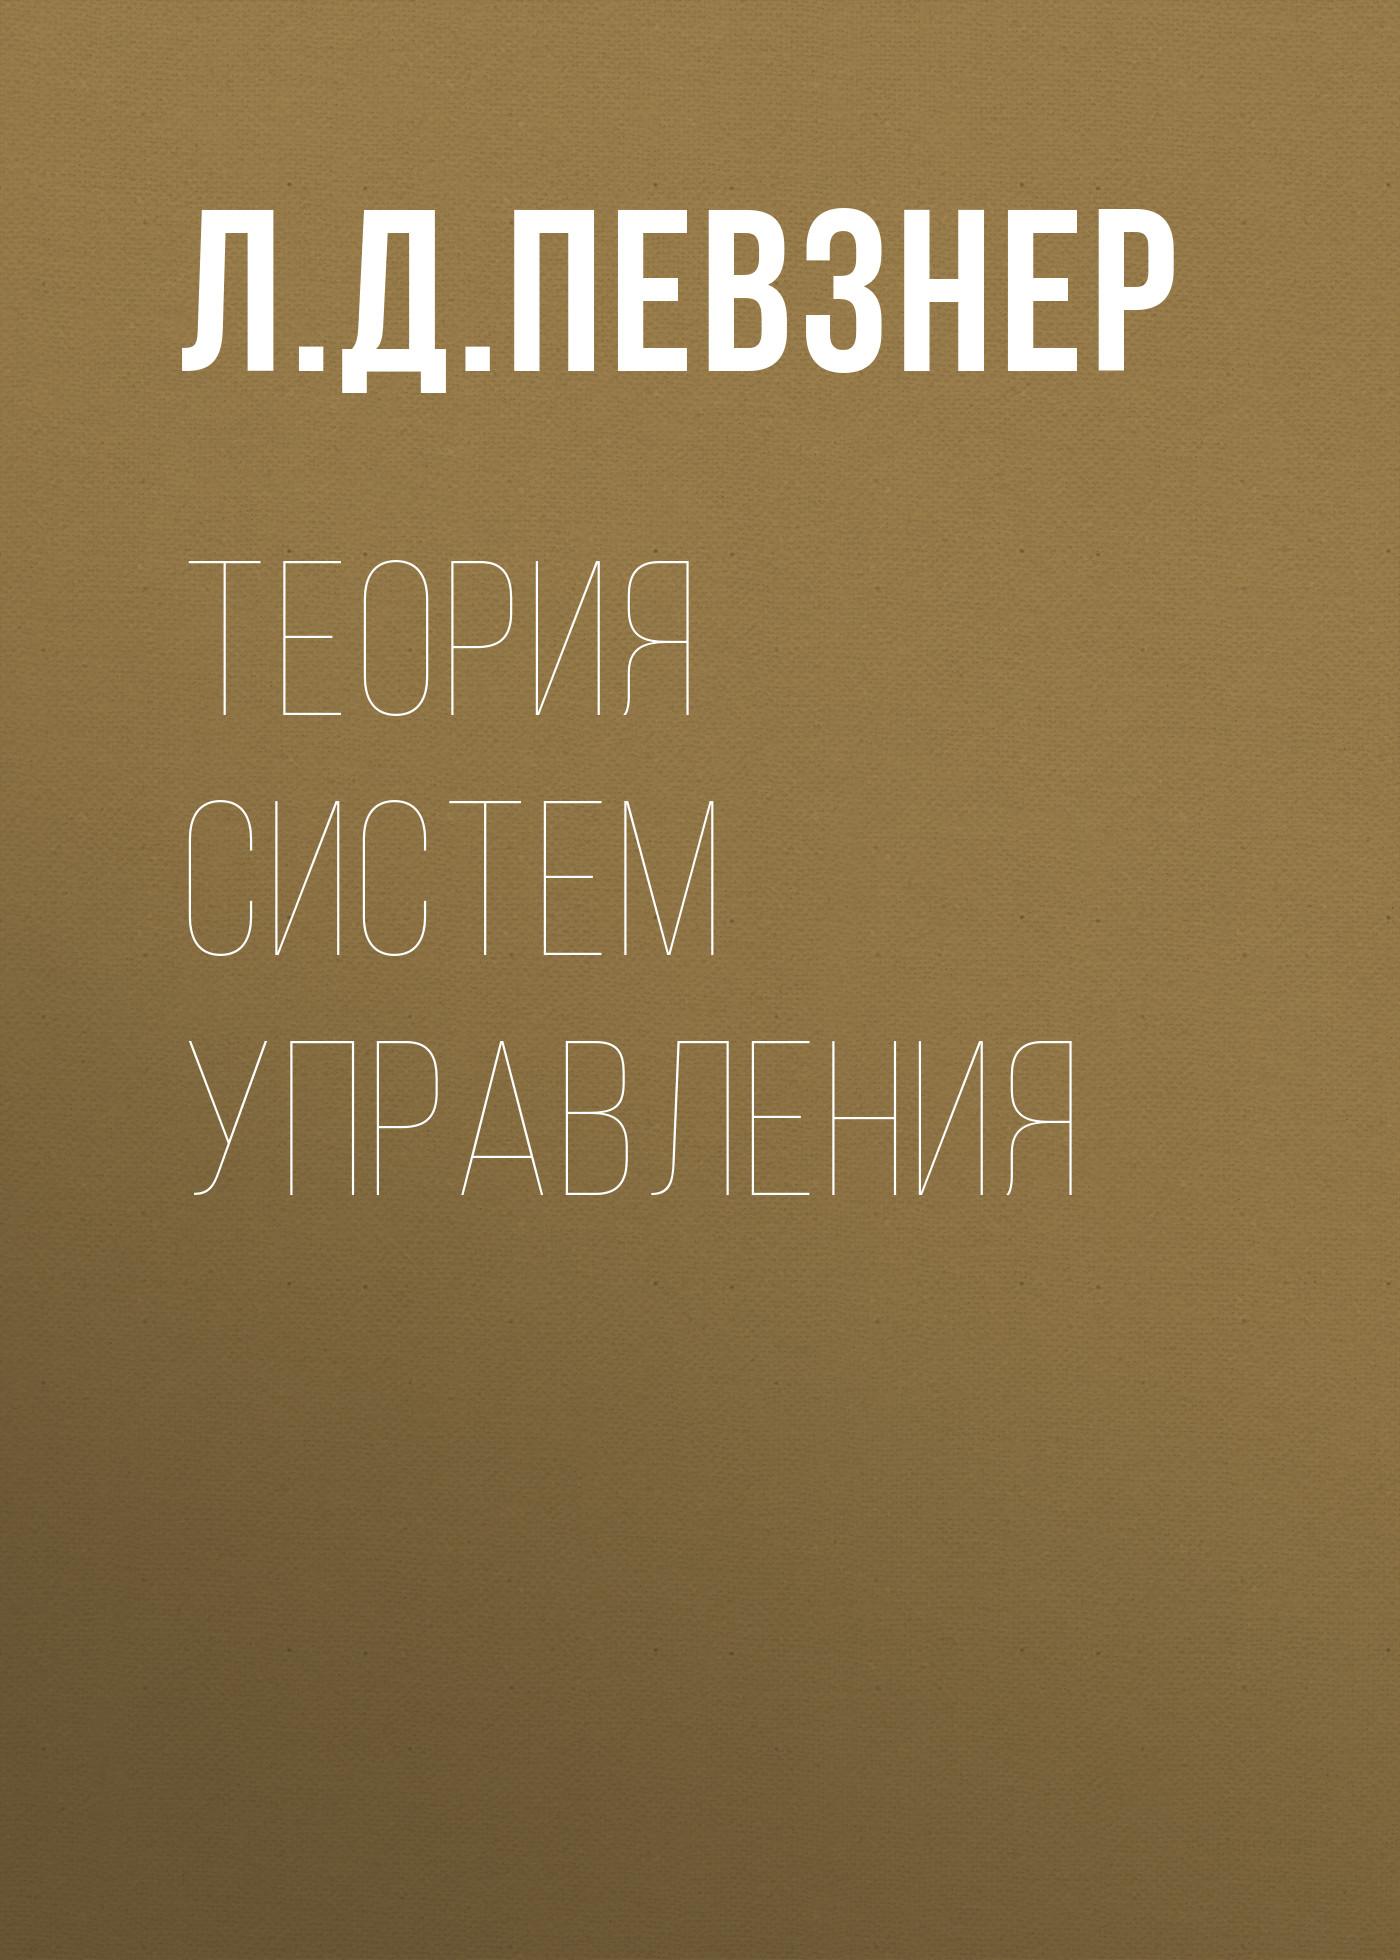 Л. Д. Певзнер Теория систем управления спот lussole lsl 7201 01